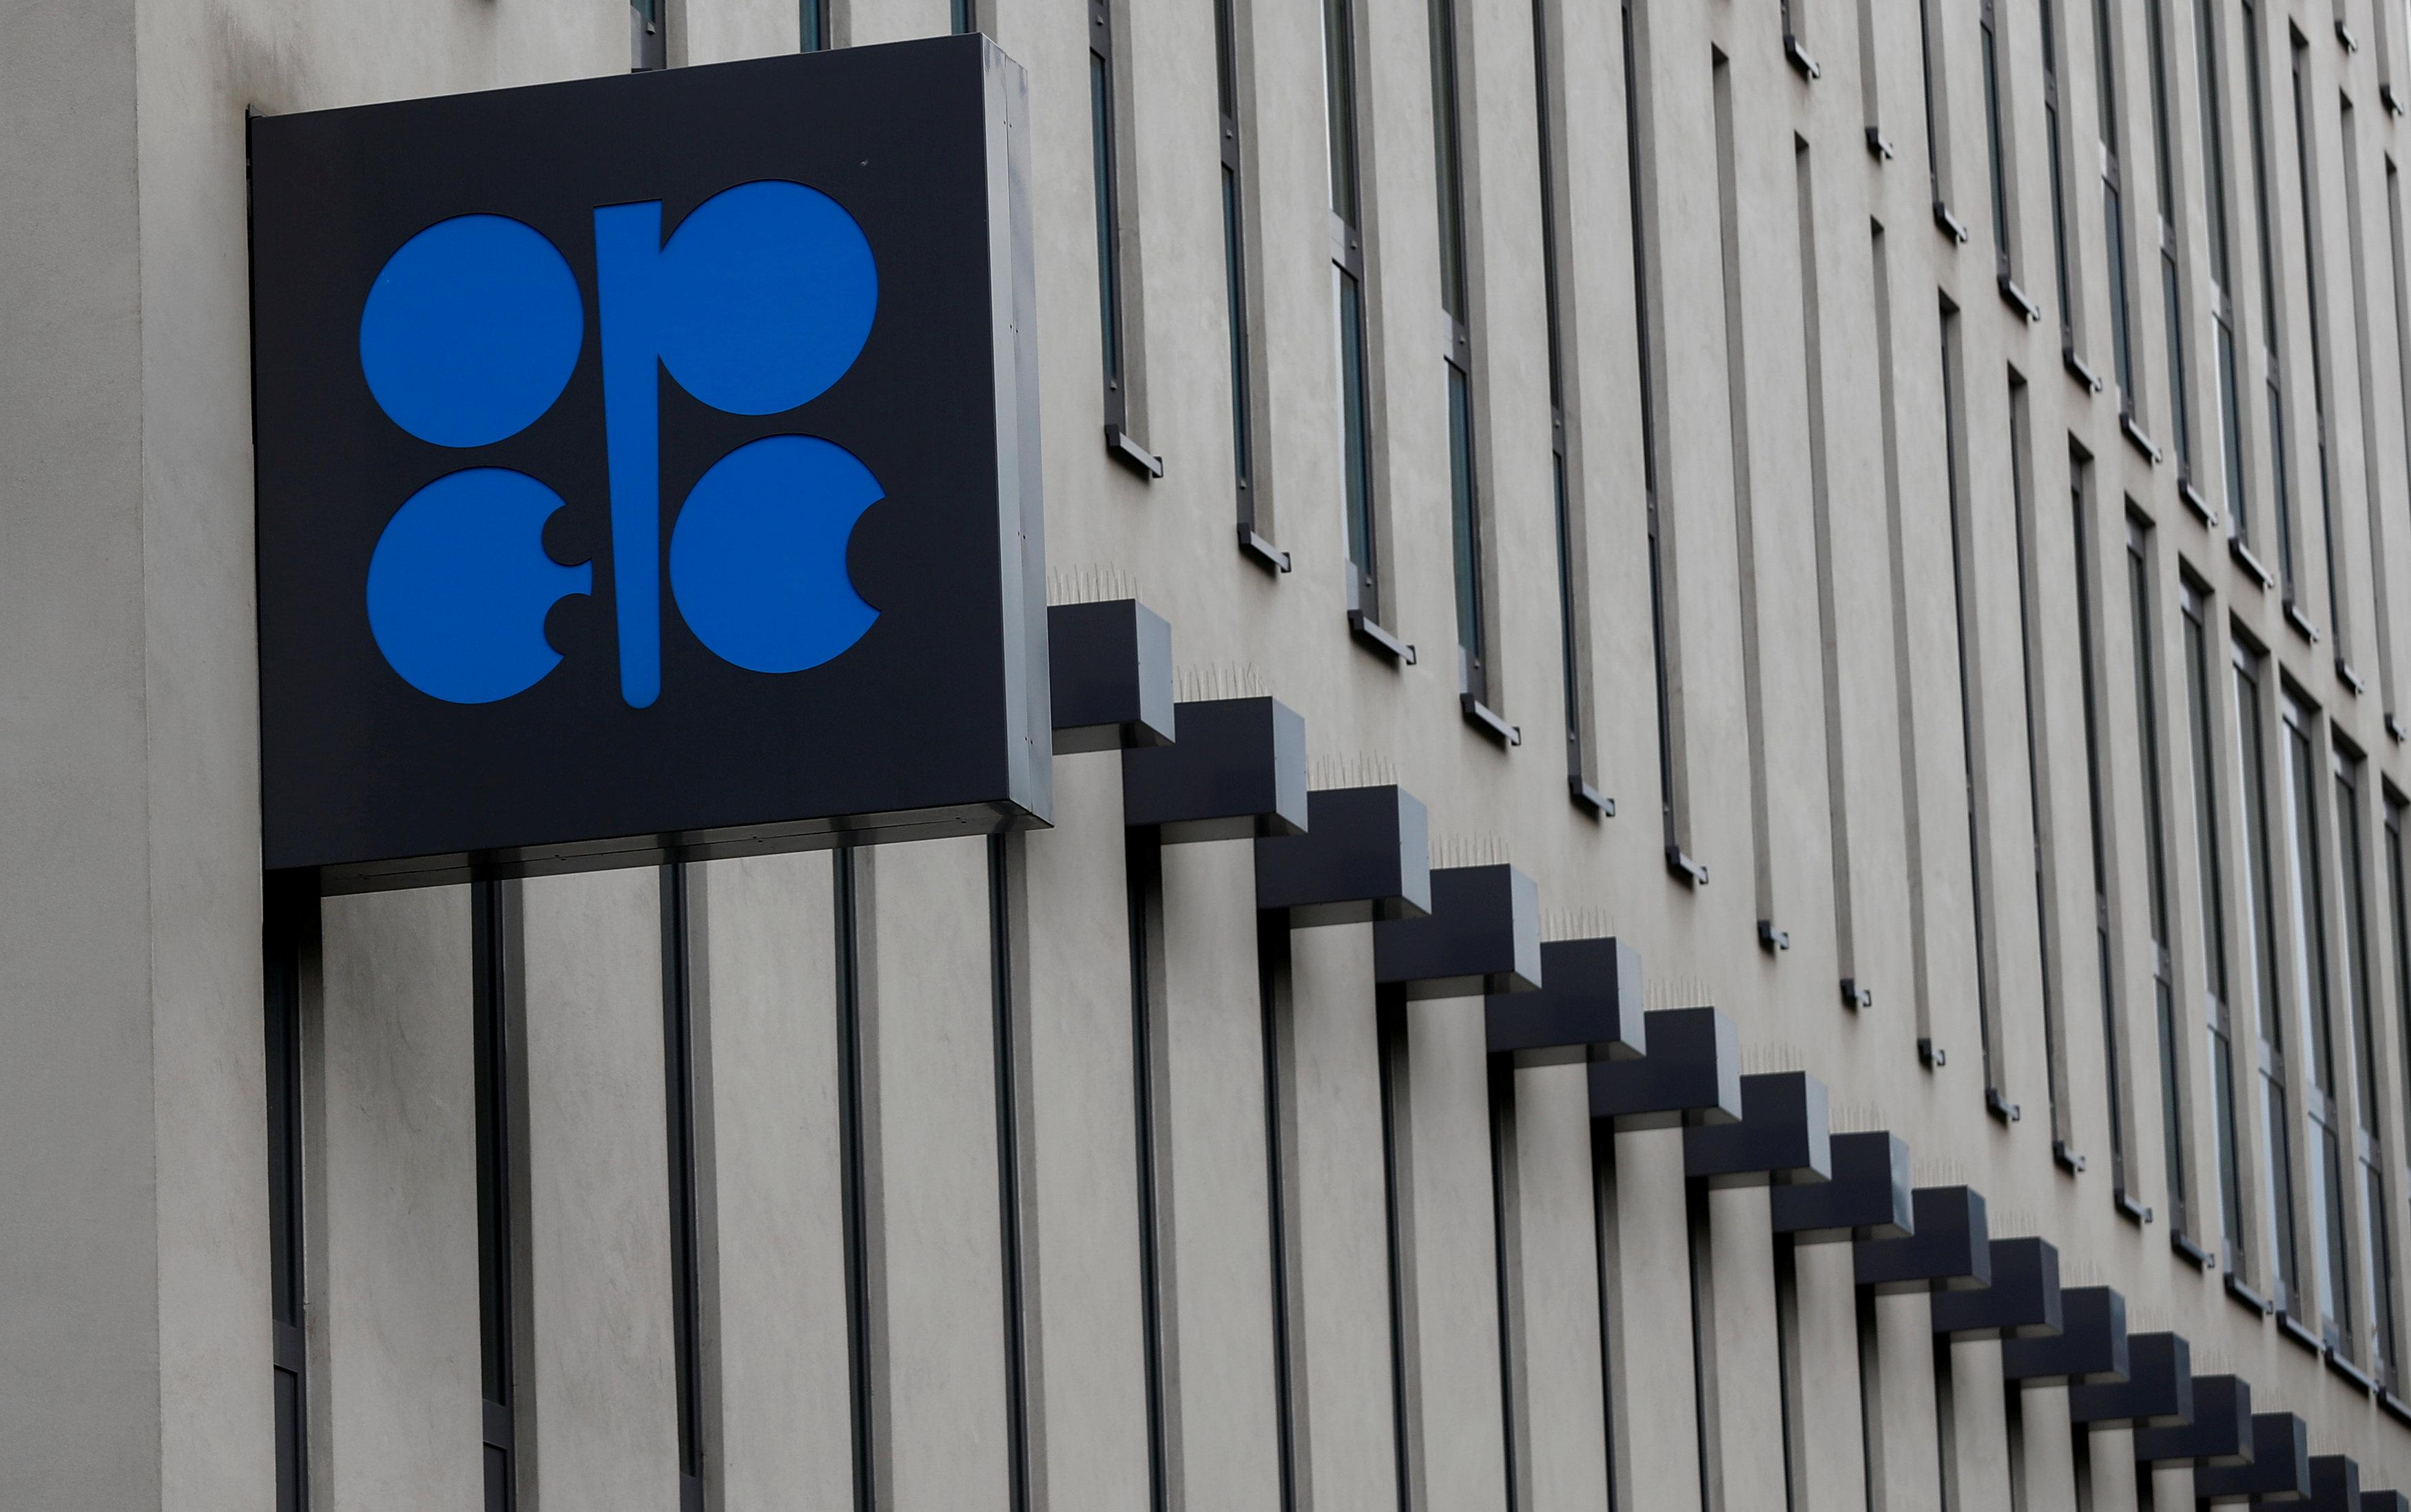 'Opec April oil output hits year low on Venezuela slide'